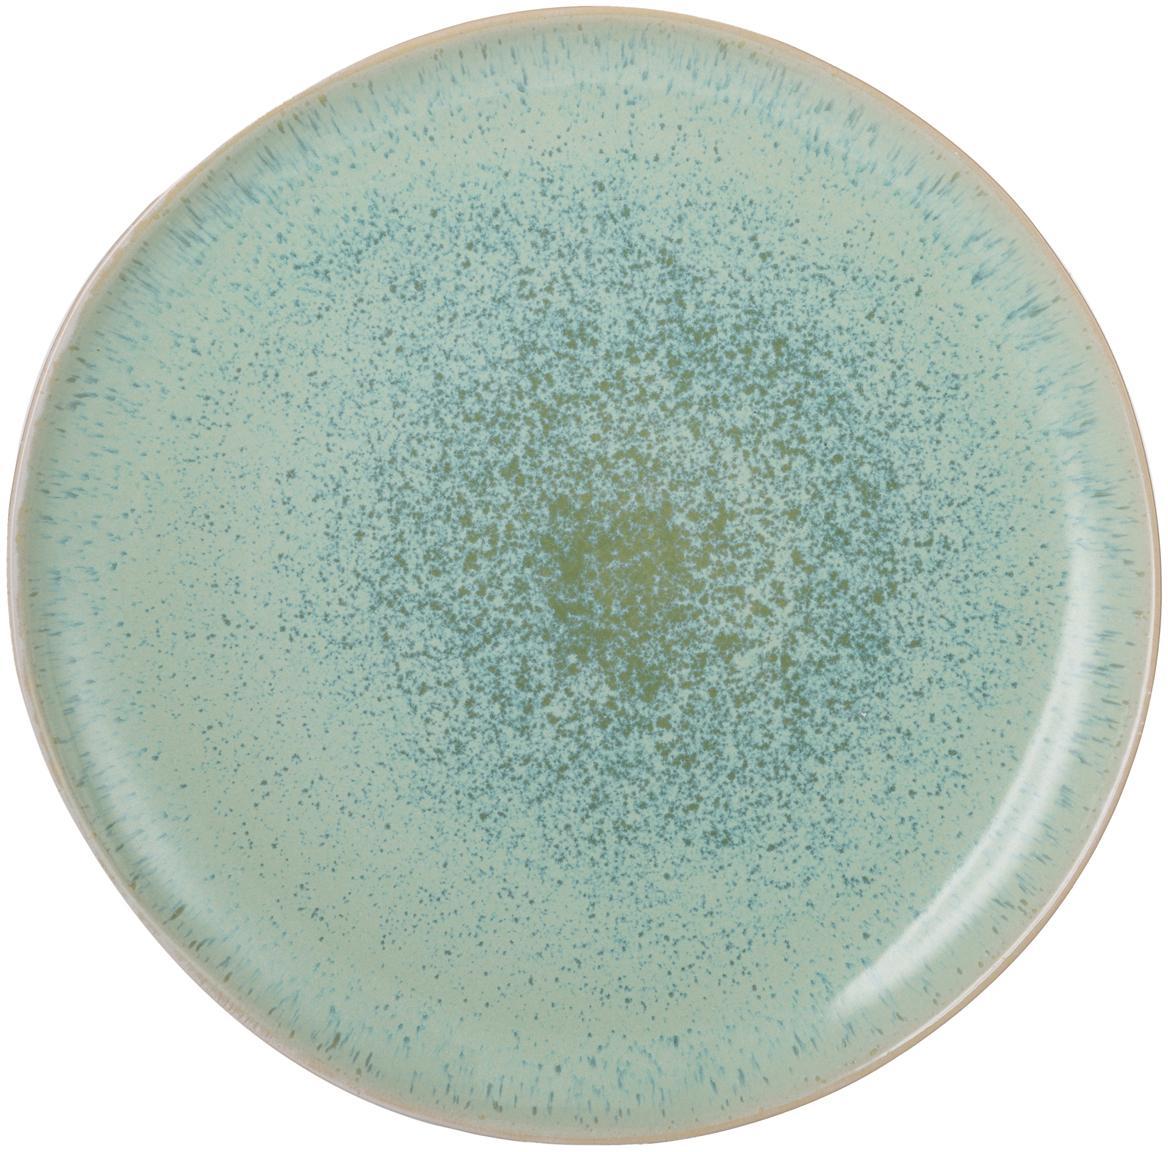 Plato llano artesanal Areia, Gres, Menta, blanco crudo, beige, Ø 28 cm